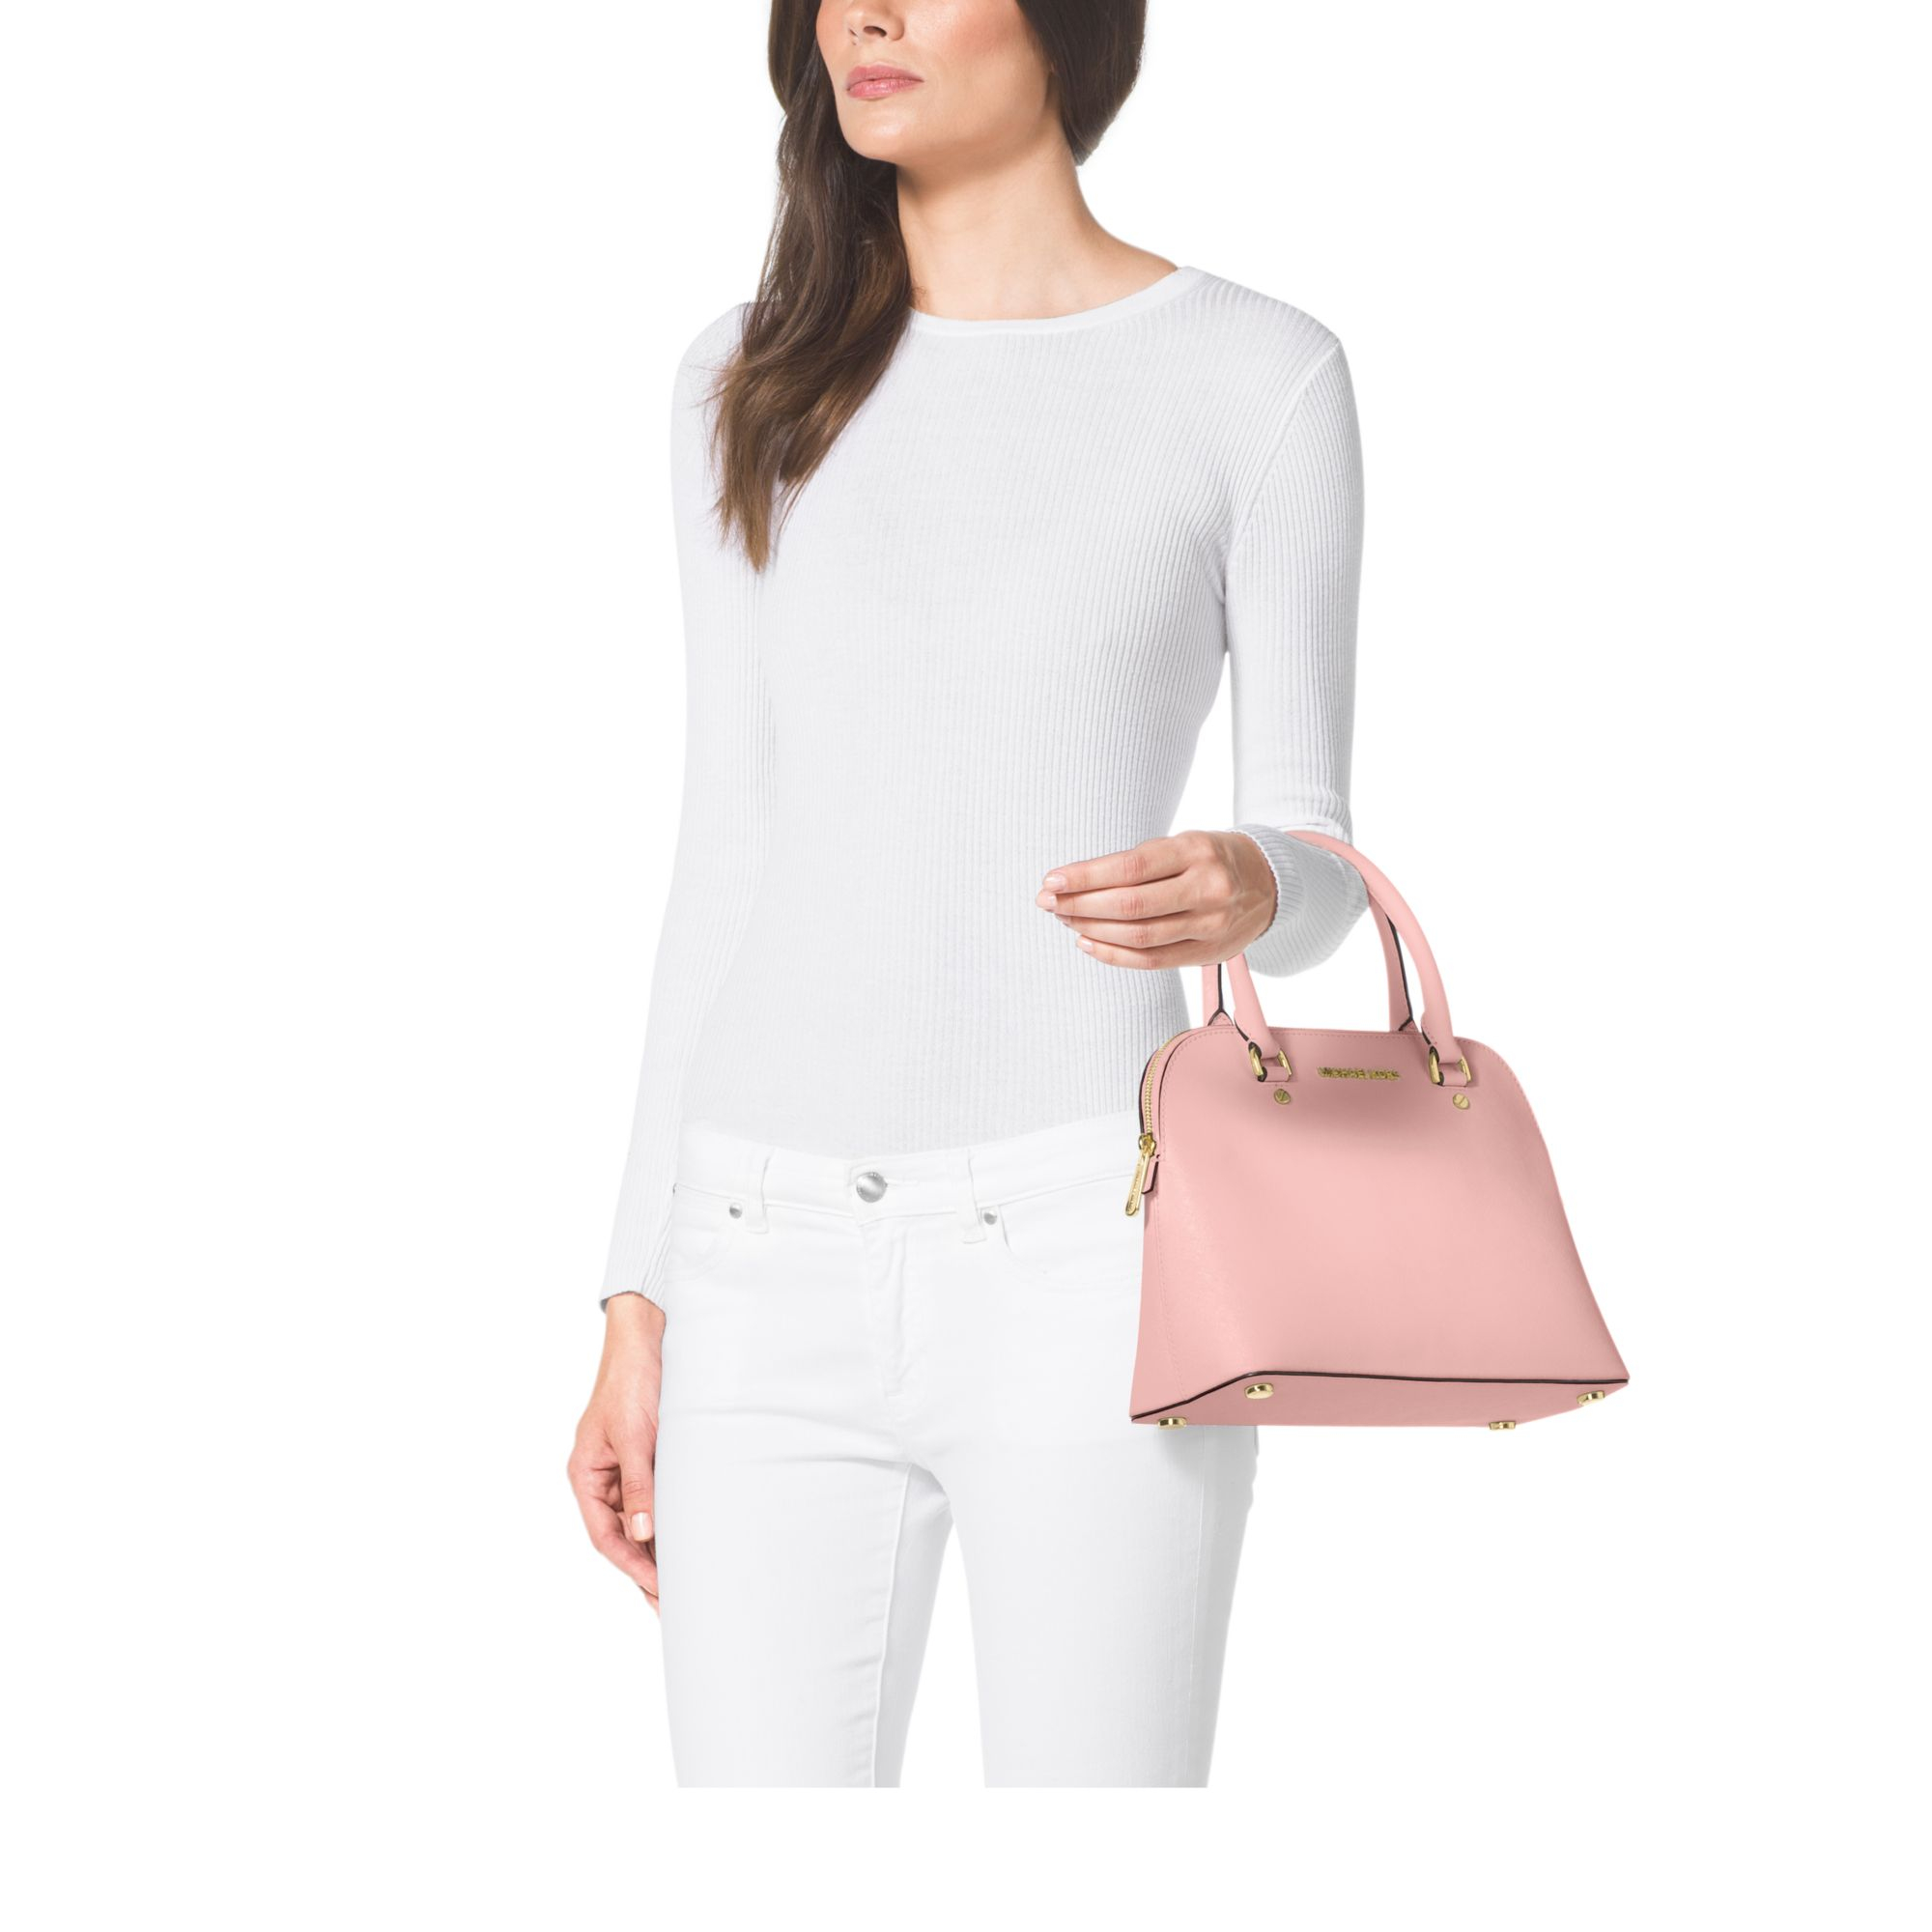 ad8e6282845c Lyst - Michael Kors Cindy Medium Saffiano Leather Satchel in Pink